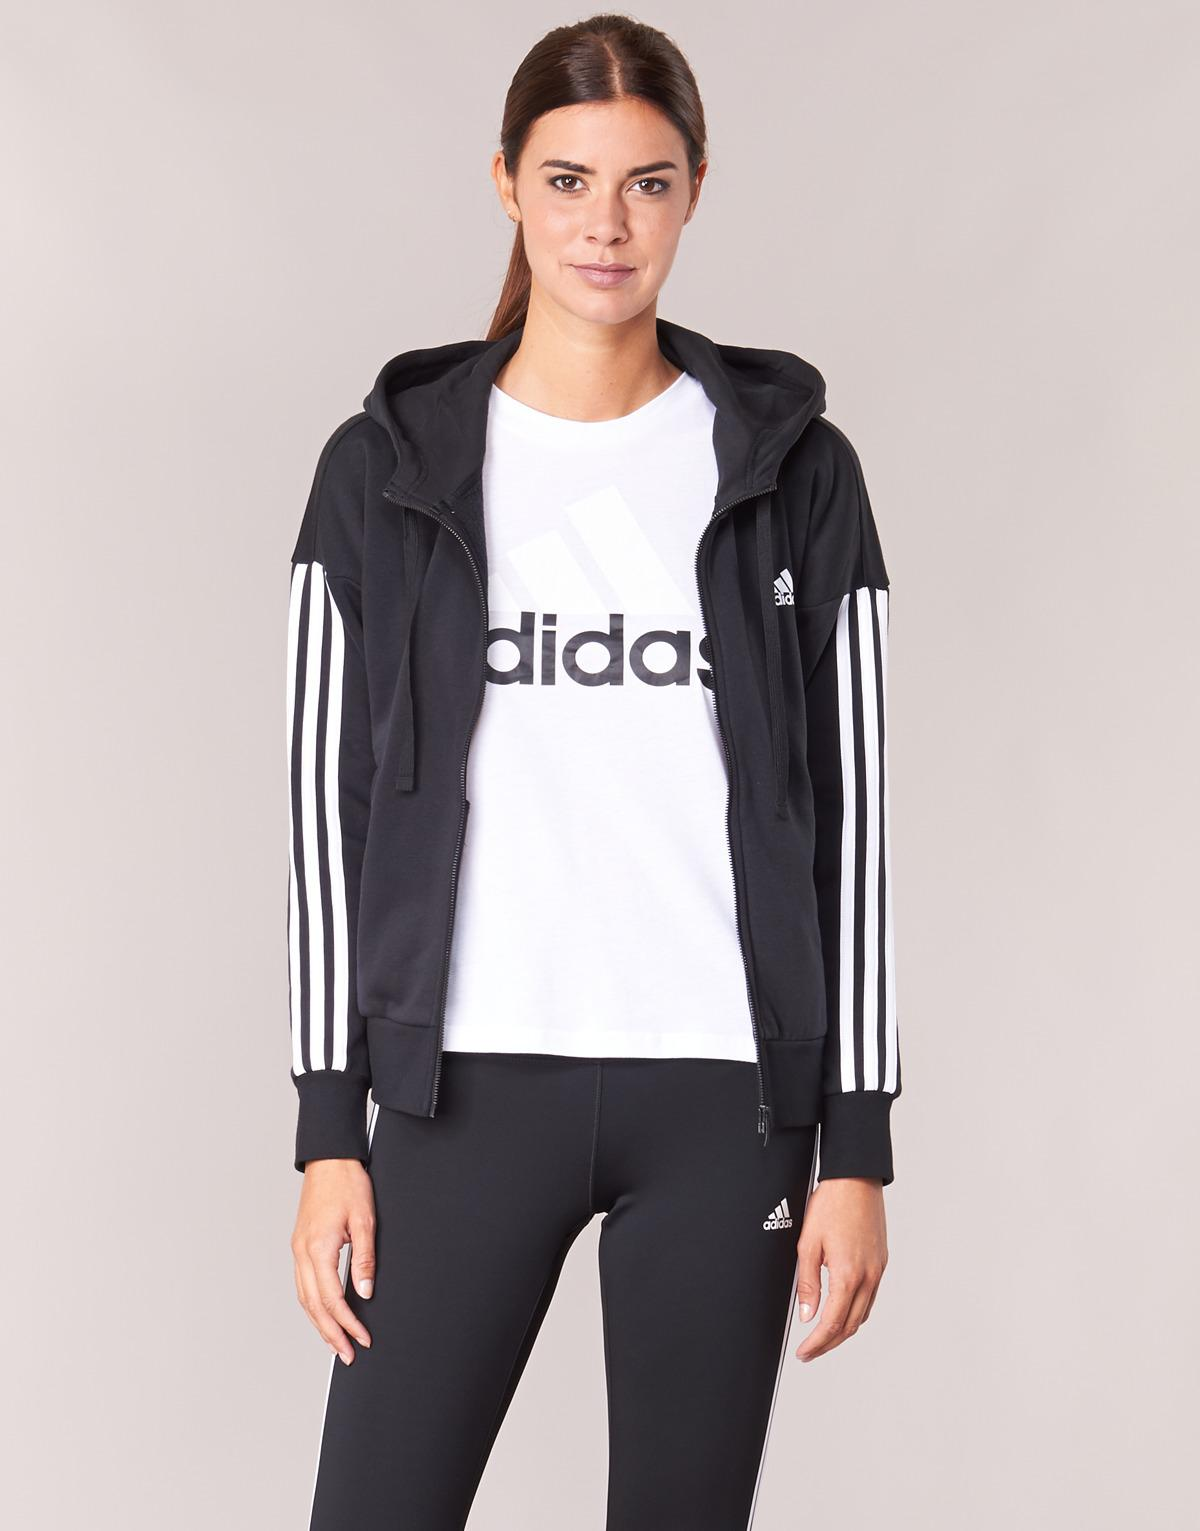 adidas Ess 3s Fz Hd Women s Sweatshirt In Black in Black - Save 10% - Lyst 5f1bf4f12